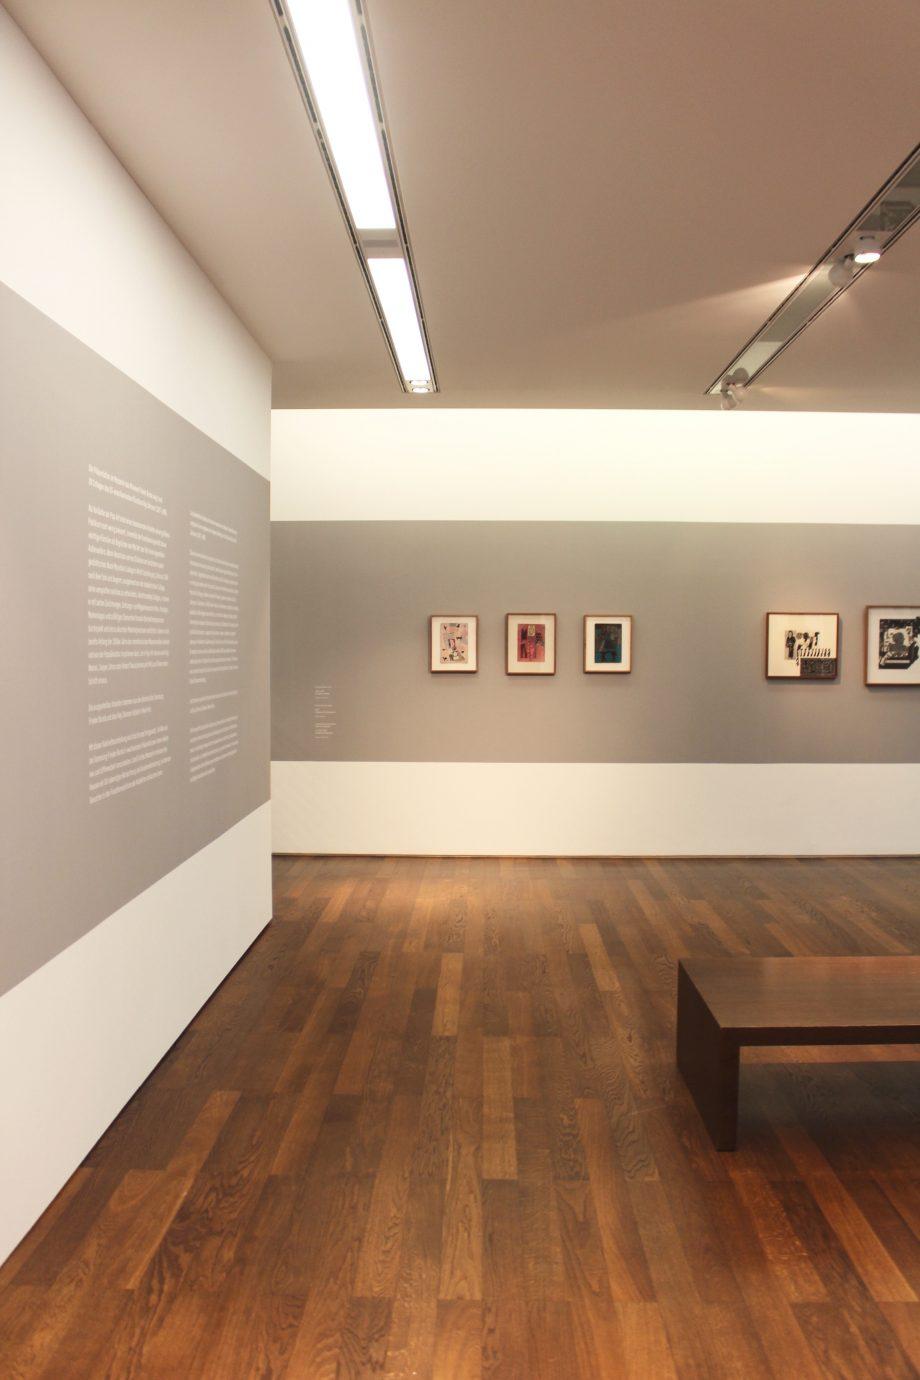 Museum Frieder Burda |06.01.2018